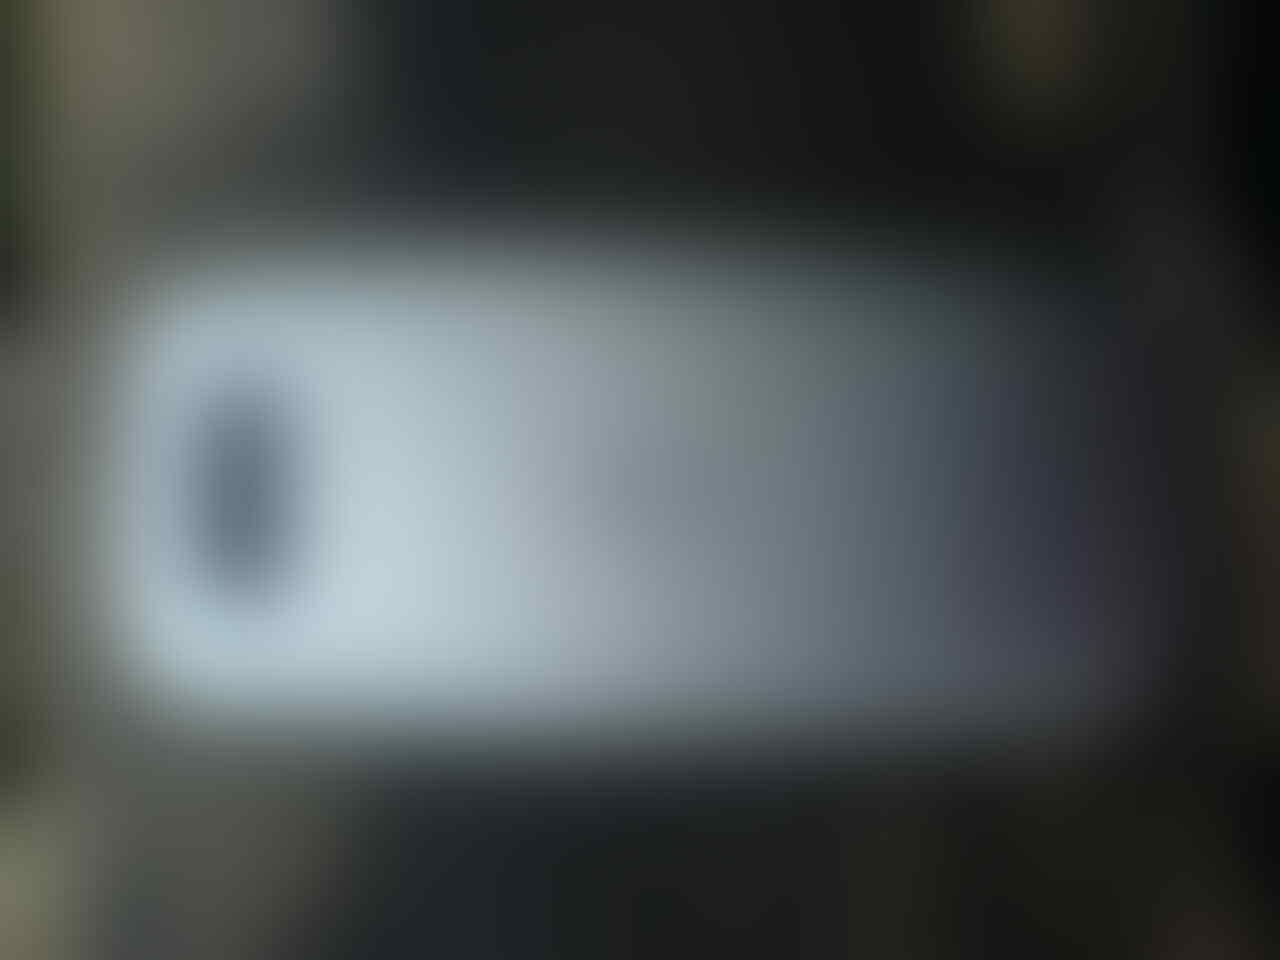 Nokia Asha 305 Dual SIM Garansi 11 Bulan Jogja COD